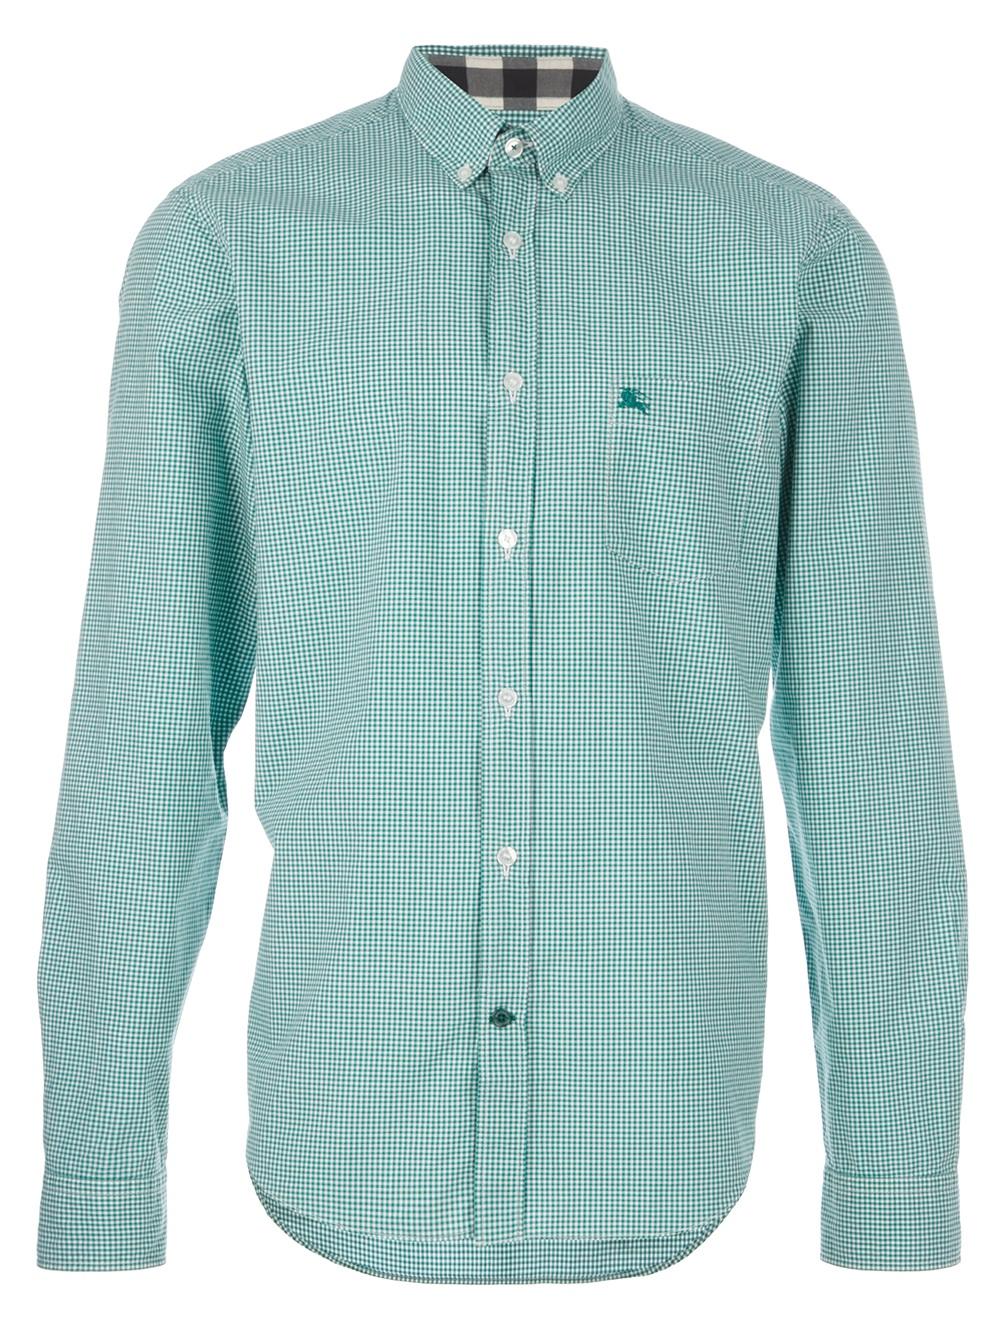 1fbd03e3 Mens Burberry White Button Down Shirt   The Art of Mike Mignola